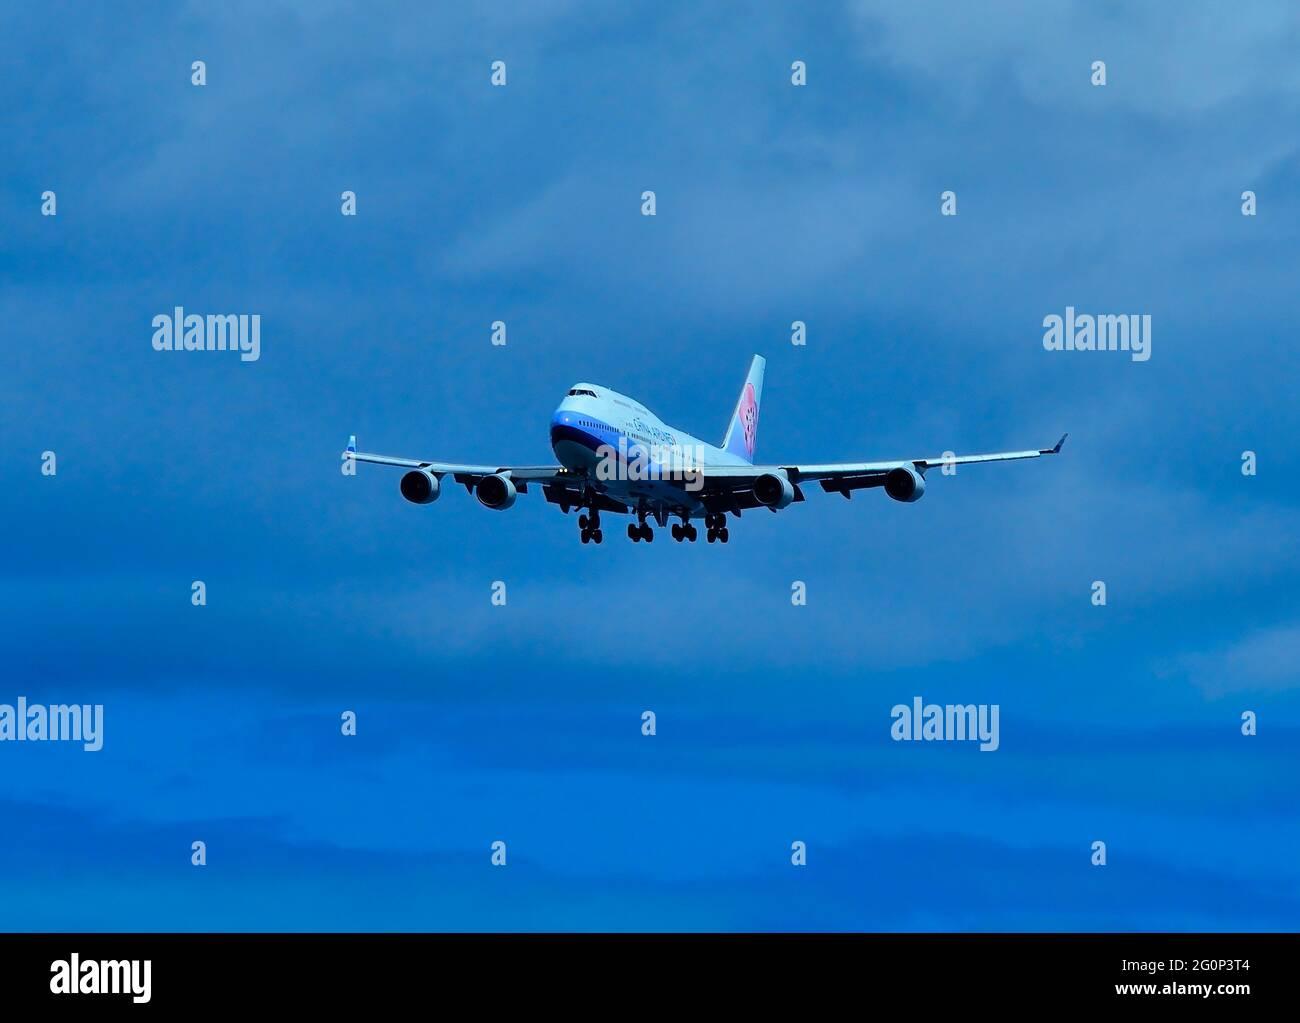 China Airlines Boeing B-747-400, B-18210, Landing at Naha Airport, Okinawa, Japan Stock Photo